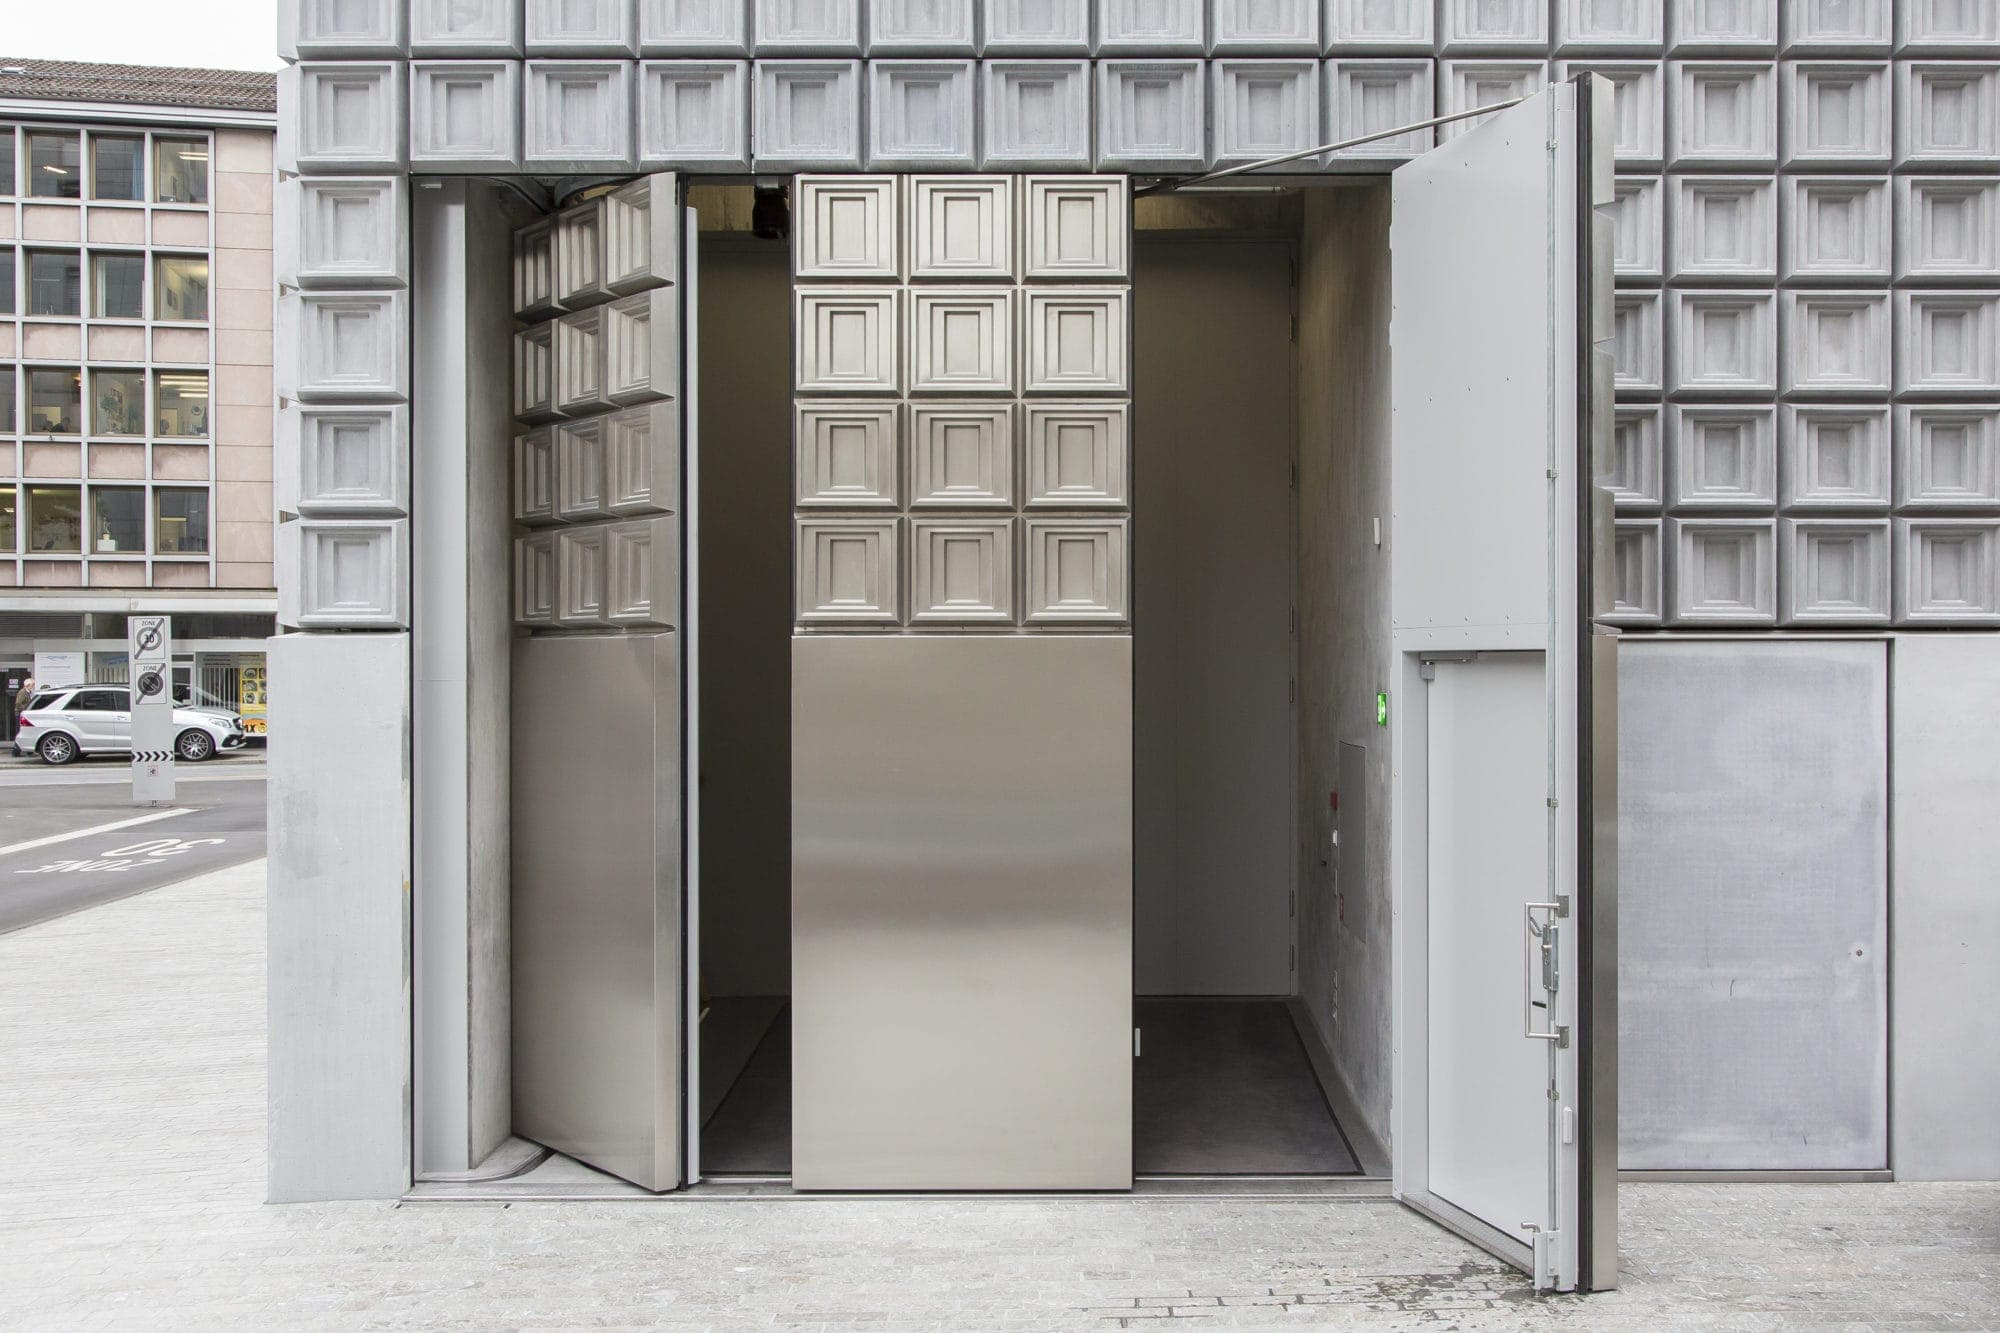 Kunstmuseum Chur (2)